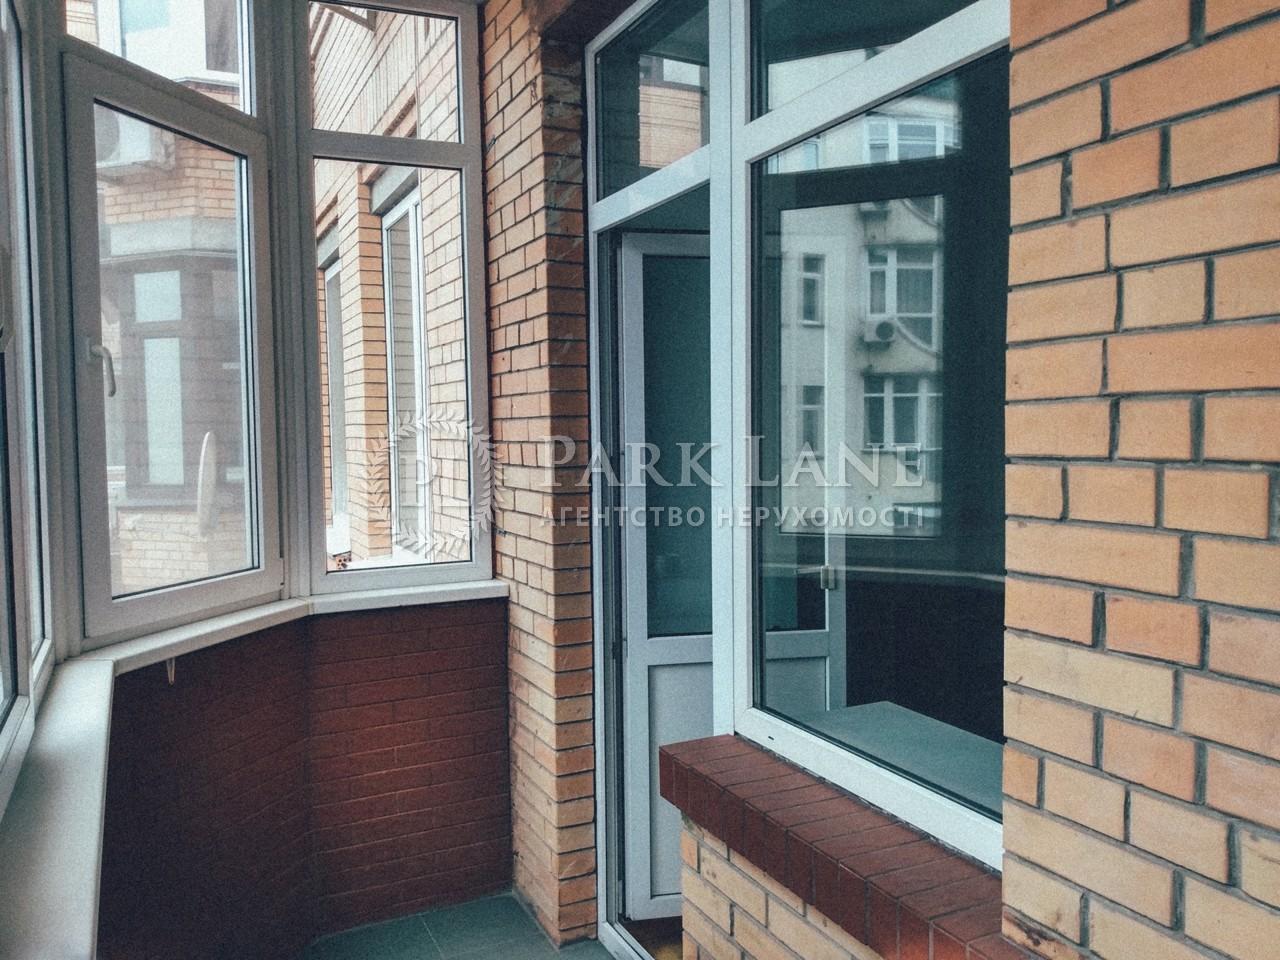 Квартира ул. Павловская, 17, Киев, H-31785 - Фото 56